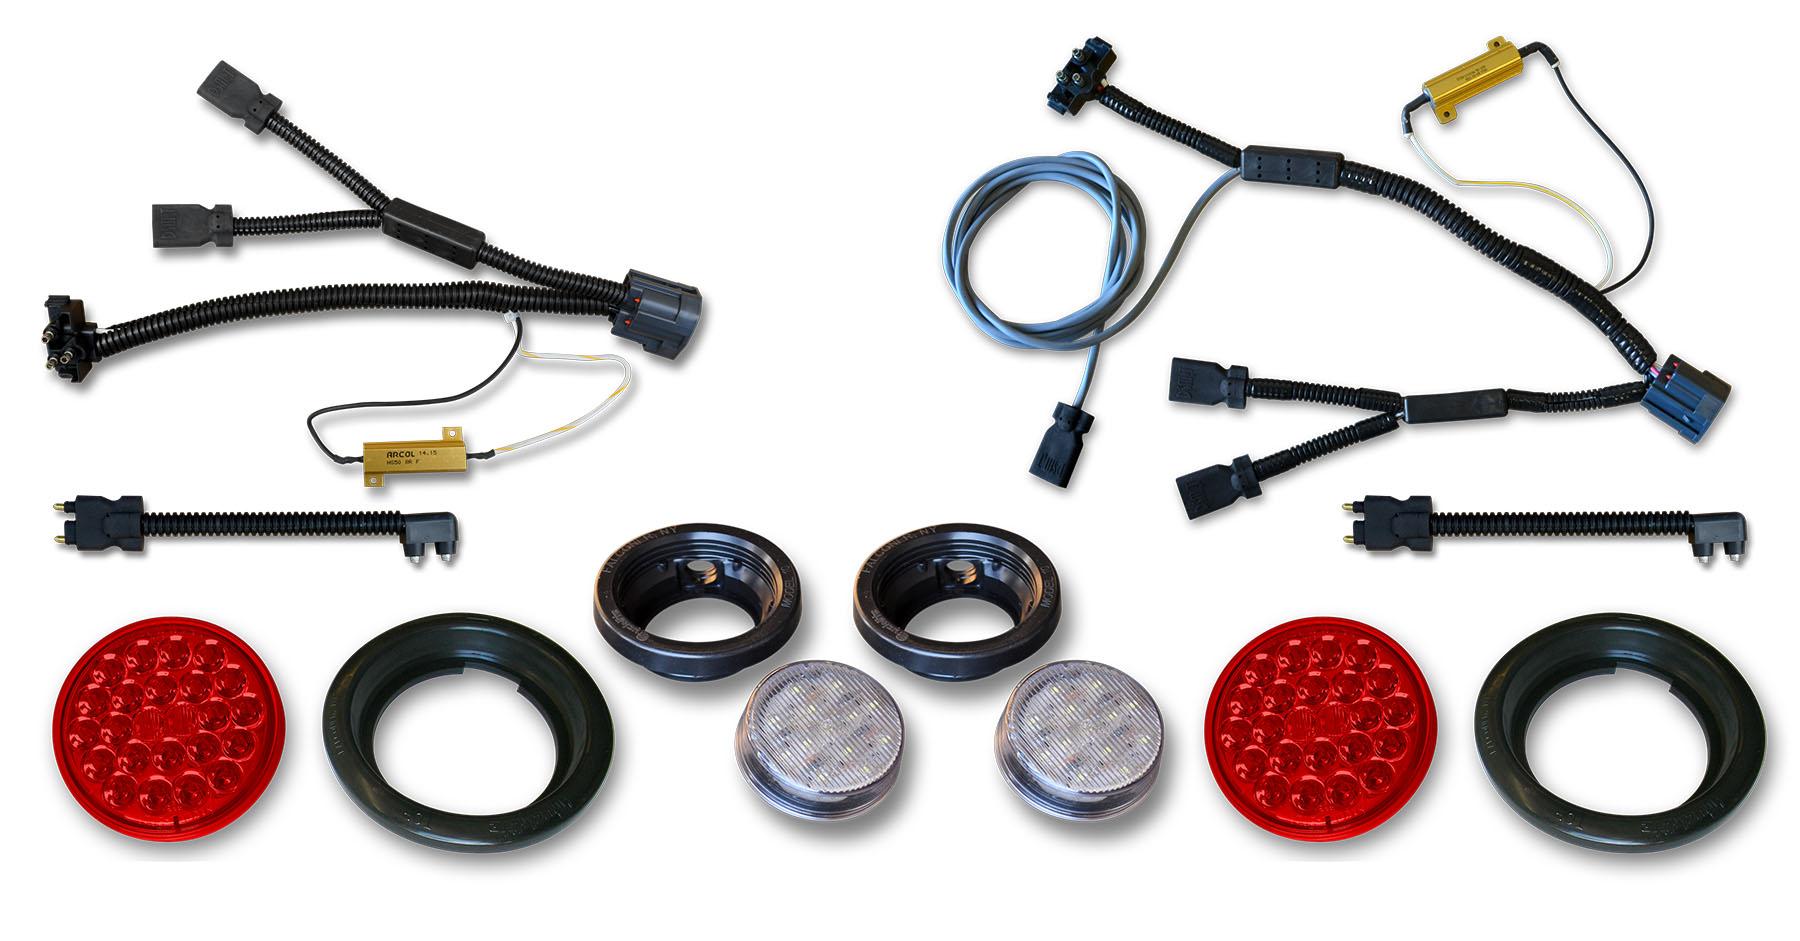 1997 jeep tj brake switch wiring poison spyder jk led tail   reverse lights   wiring harness kit  reverse lights   wiring harness kit